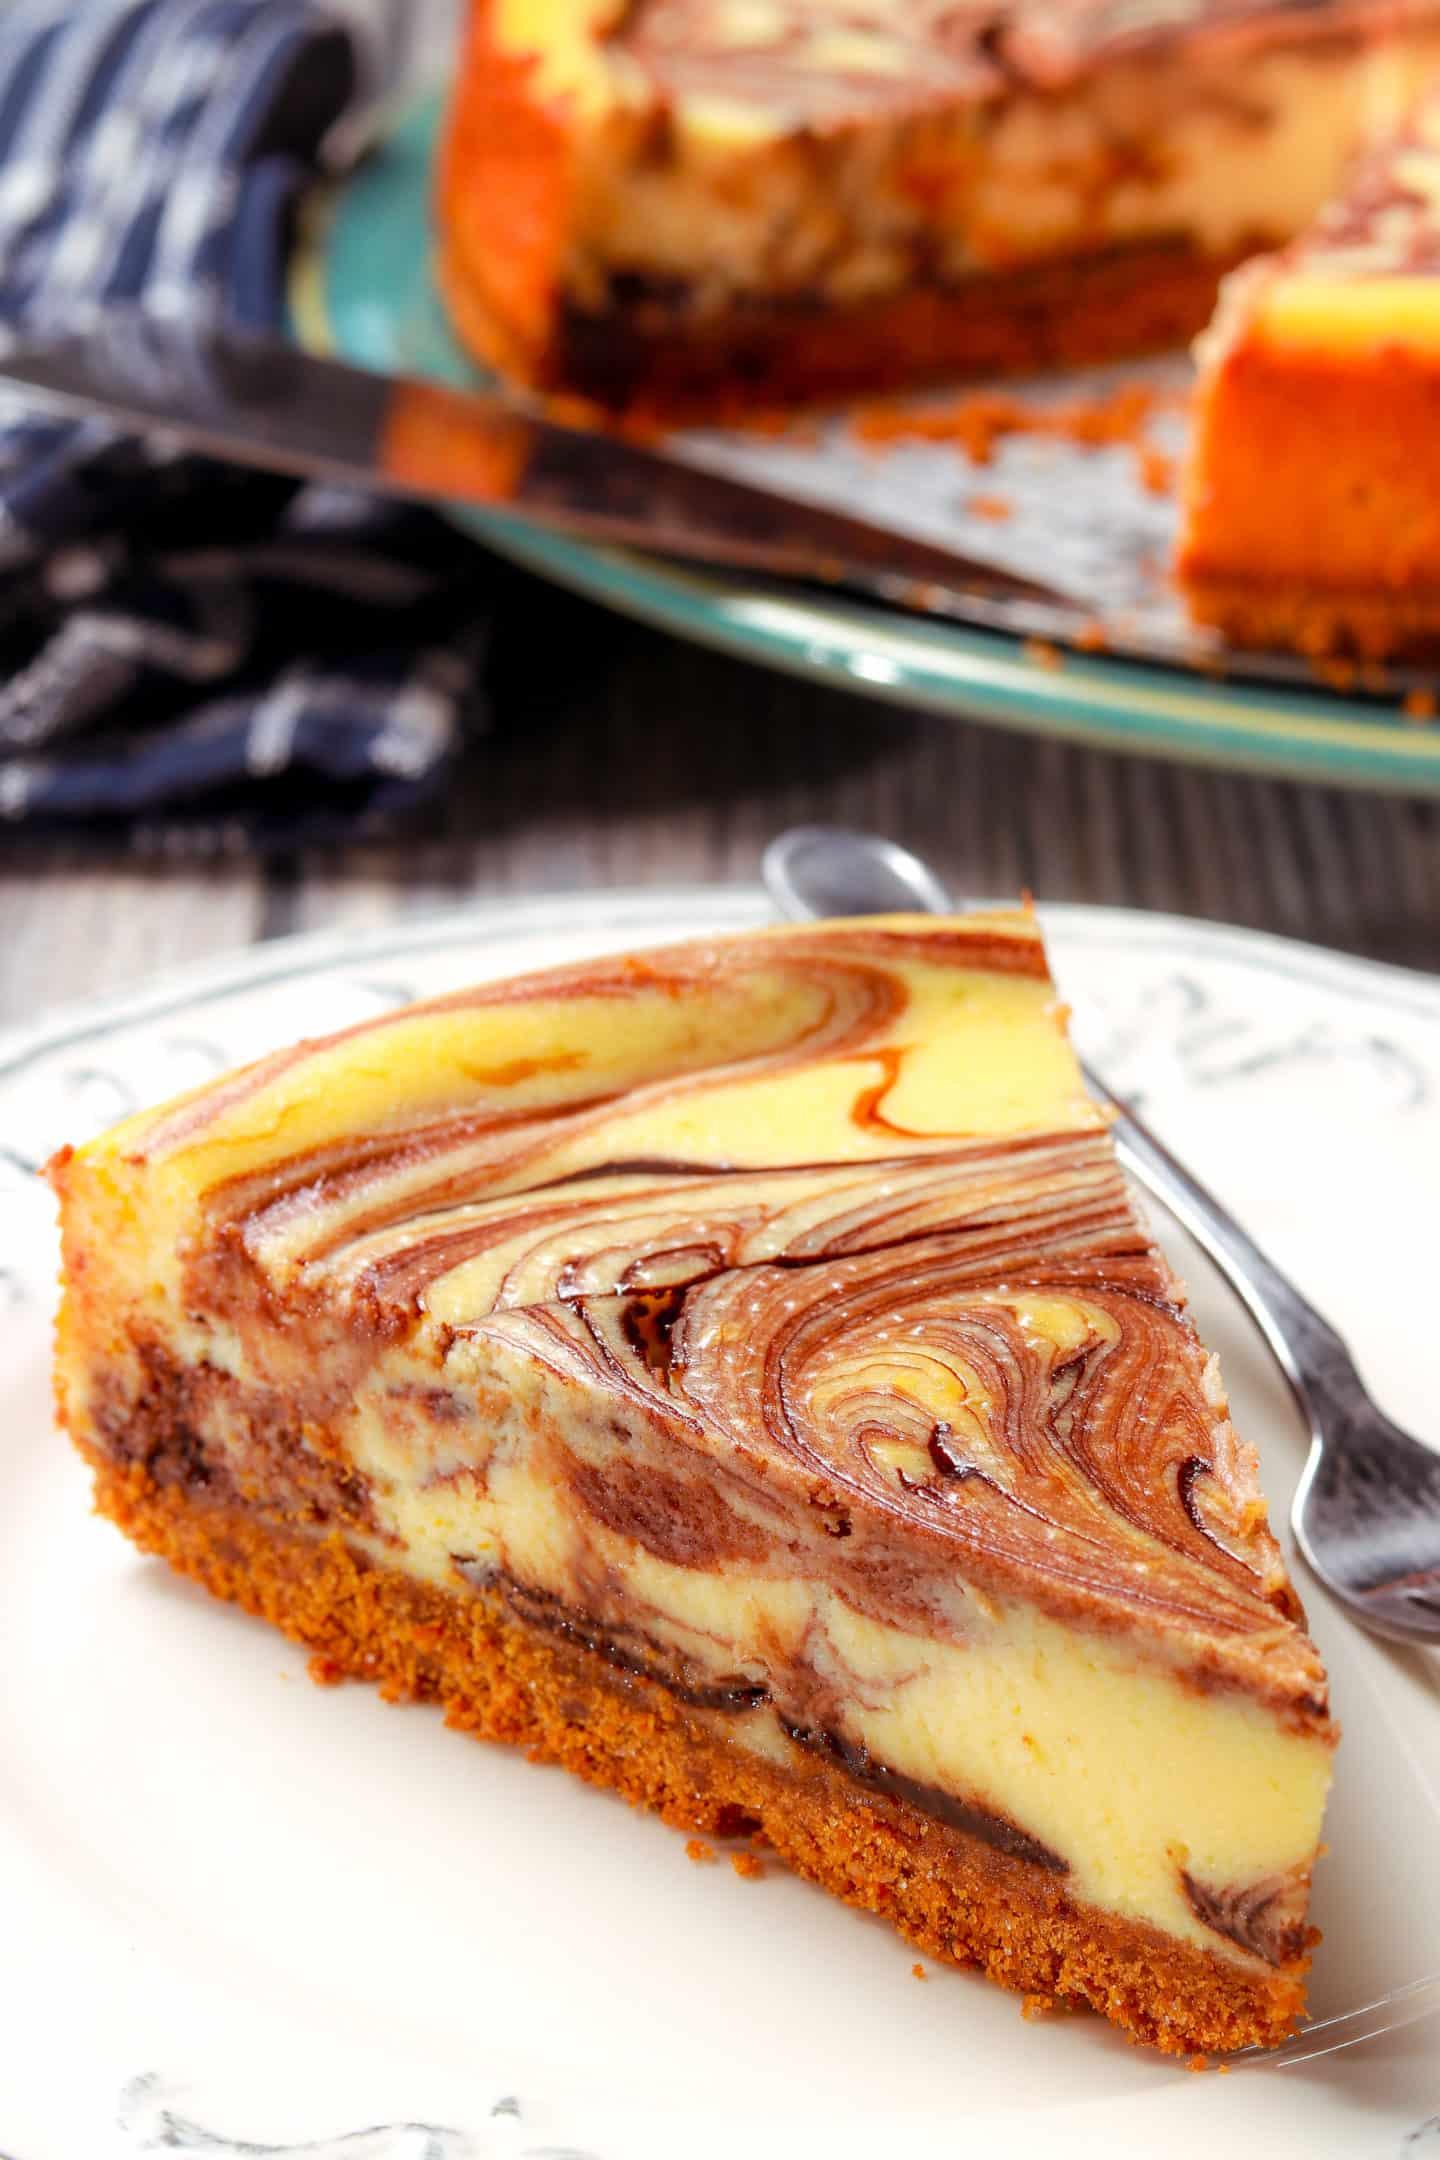 Hot Fudge Marble Cheesecake